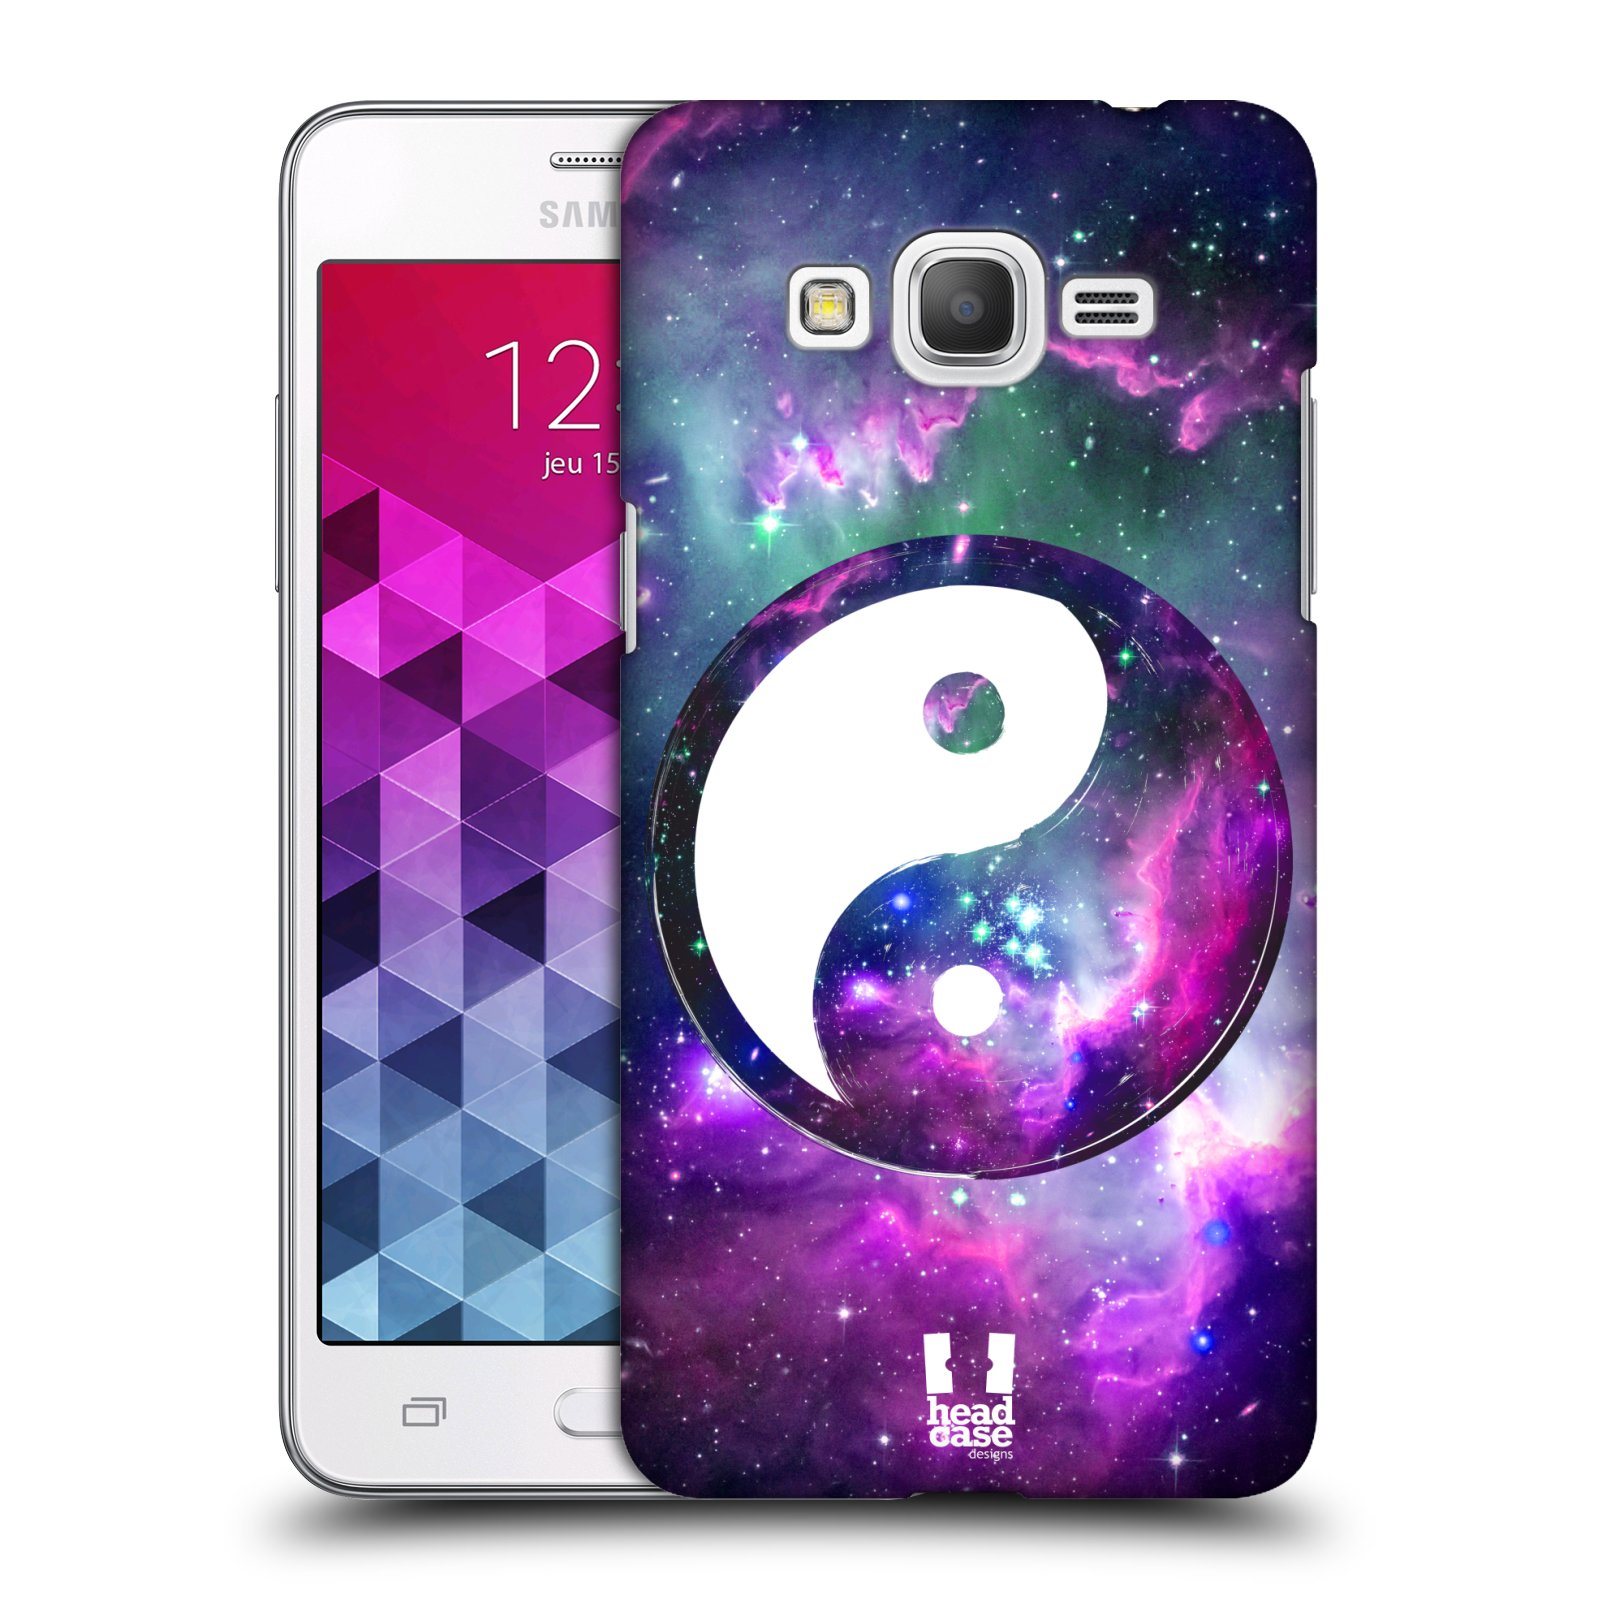 Plastové pouzdro na mobil Samsung Galaxy Grand Prime HEAD CASE Yin a Yang PURPLE (Kryt či obal na mobilní telefon Samsung Galaxy Grand Prime SM-G530)